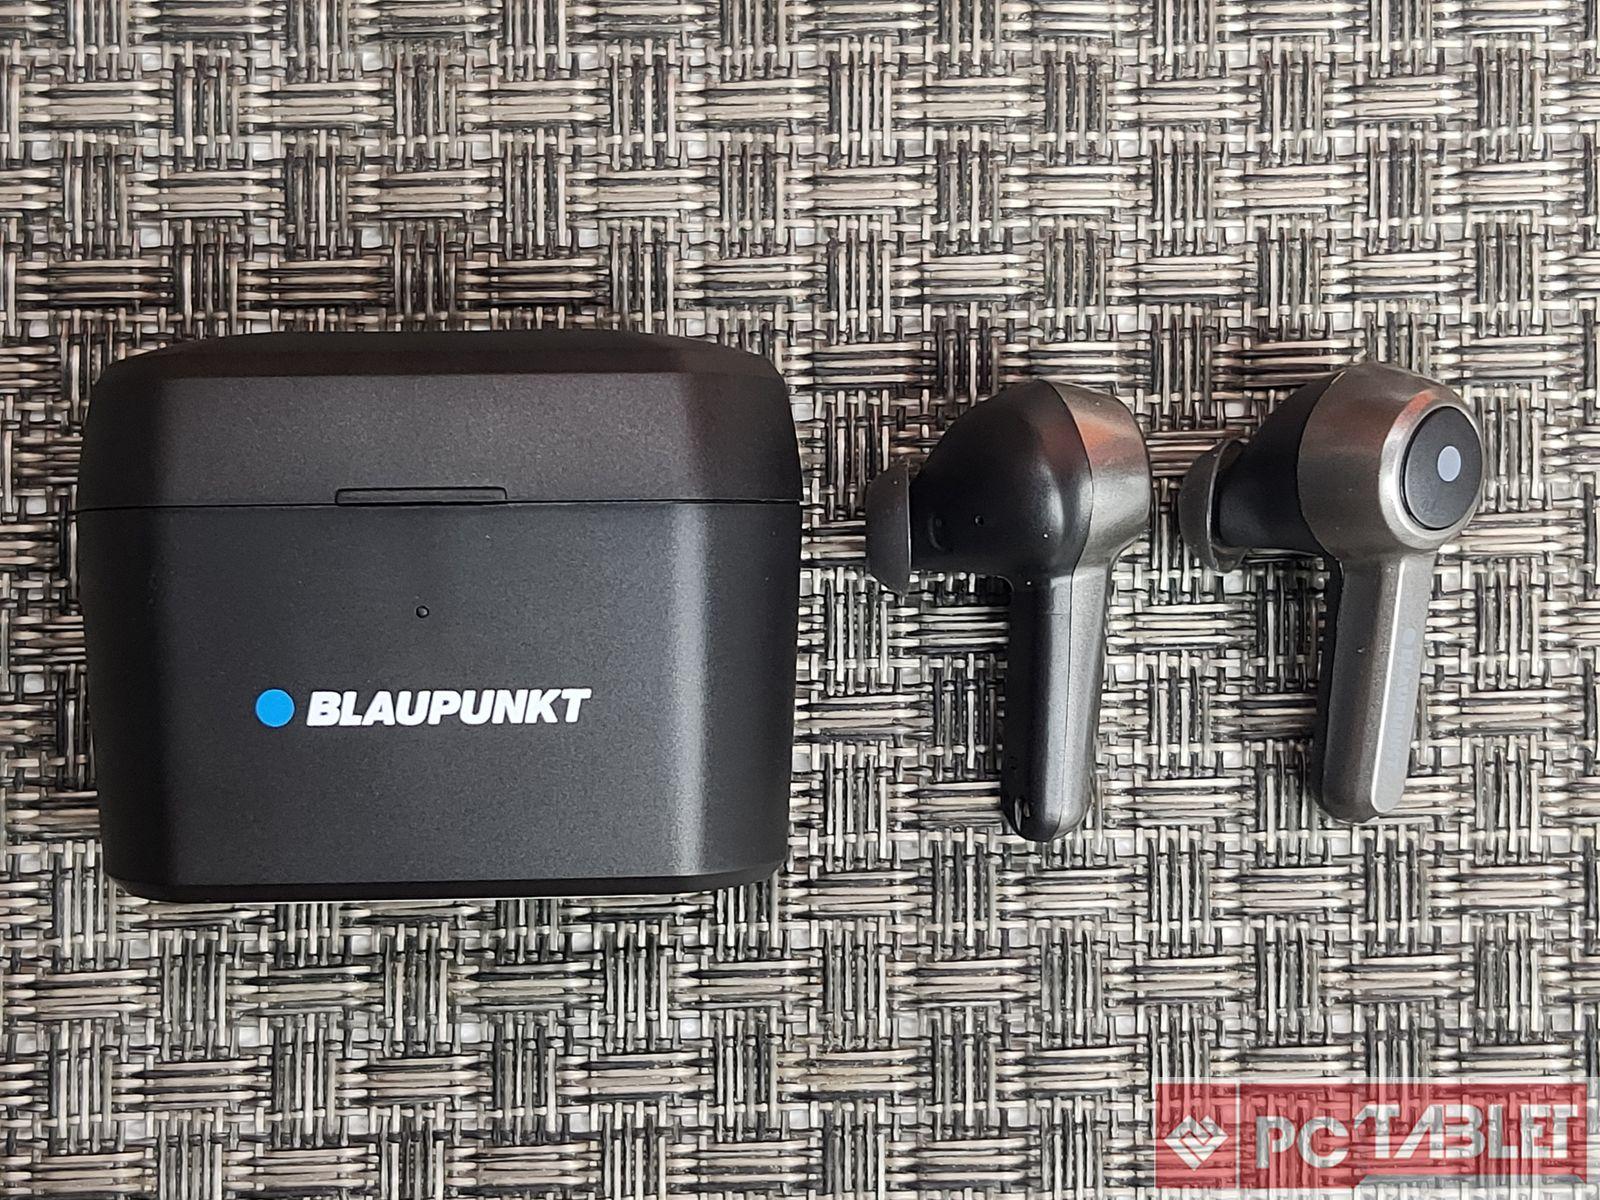 Blaupunkt BTW Pro Truly Wireless Earbuds Review 2